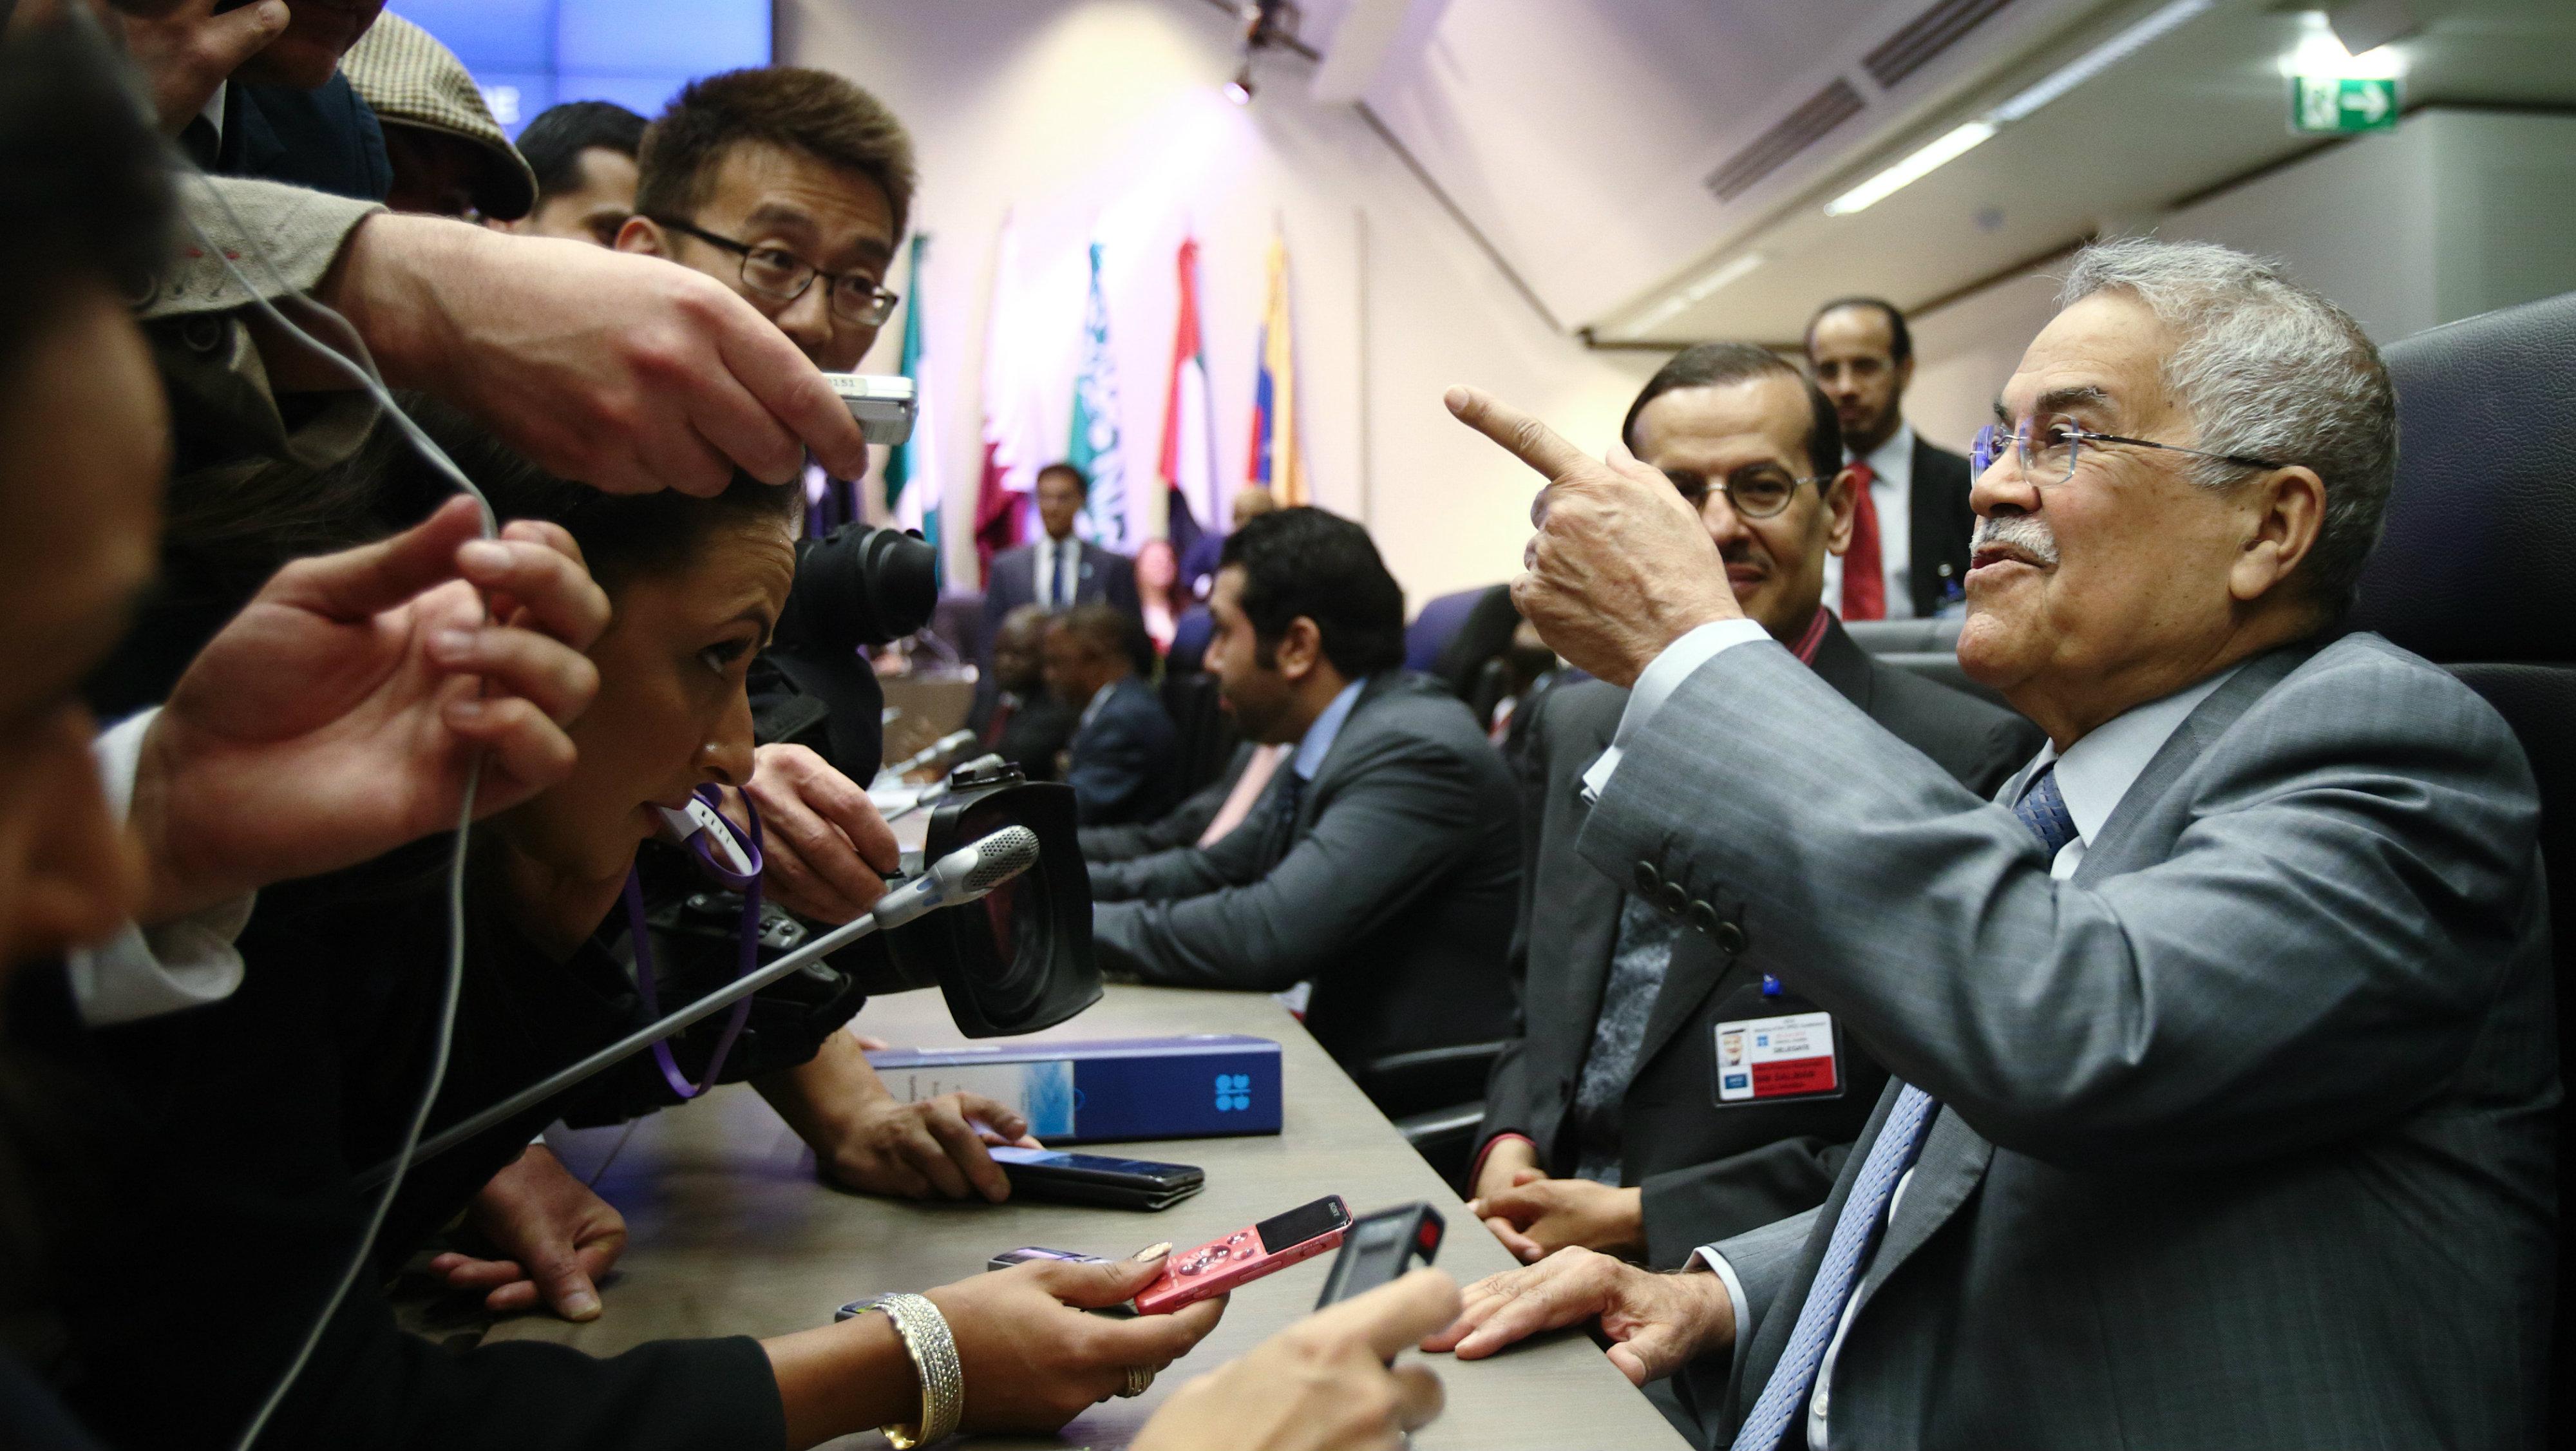 Saudi Arabia's Oil Minister Ali al-Naimi talks to journalists before a meeting of OPEC oil ministers in Vienna, Austria, June 5, 2015..